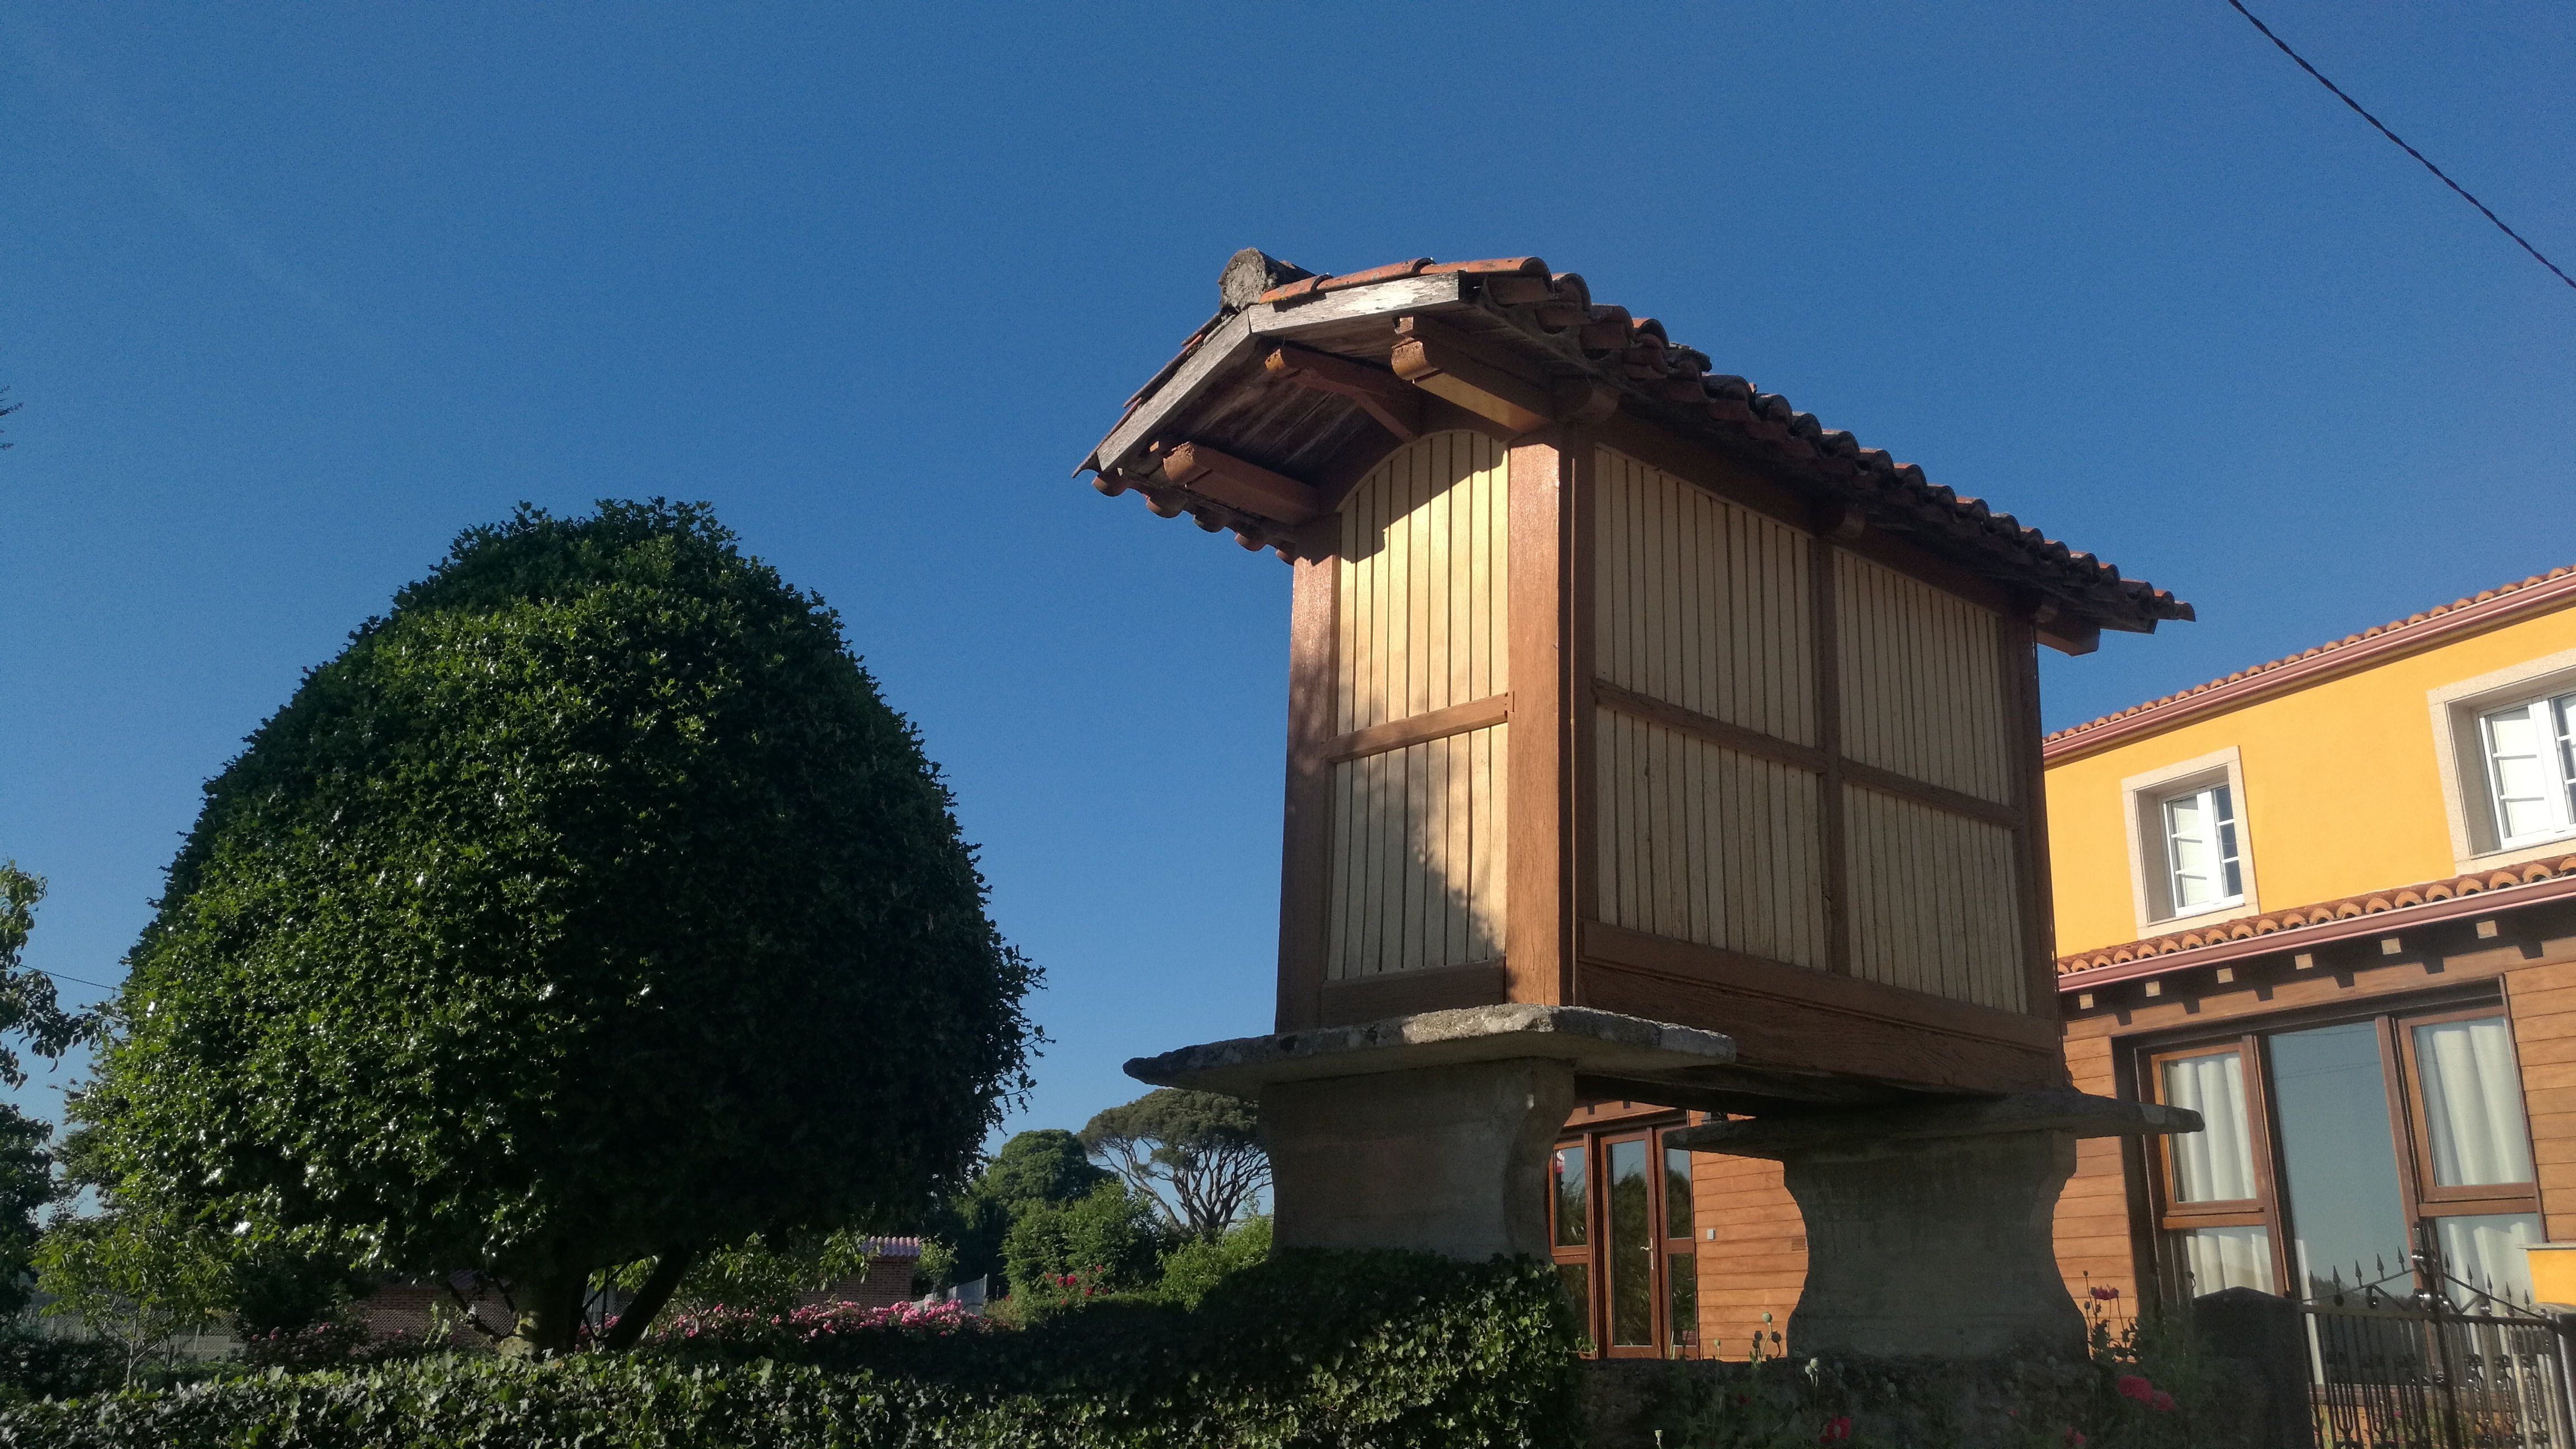 Típico pazo Gallego en Boente